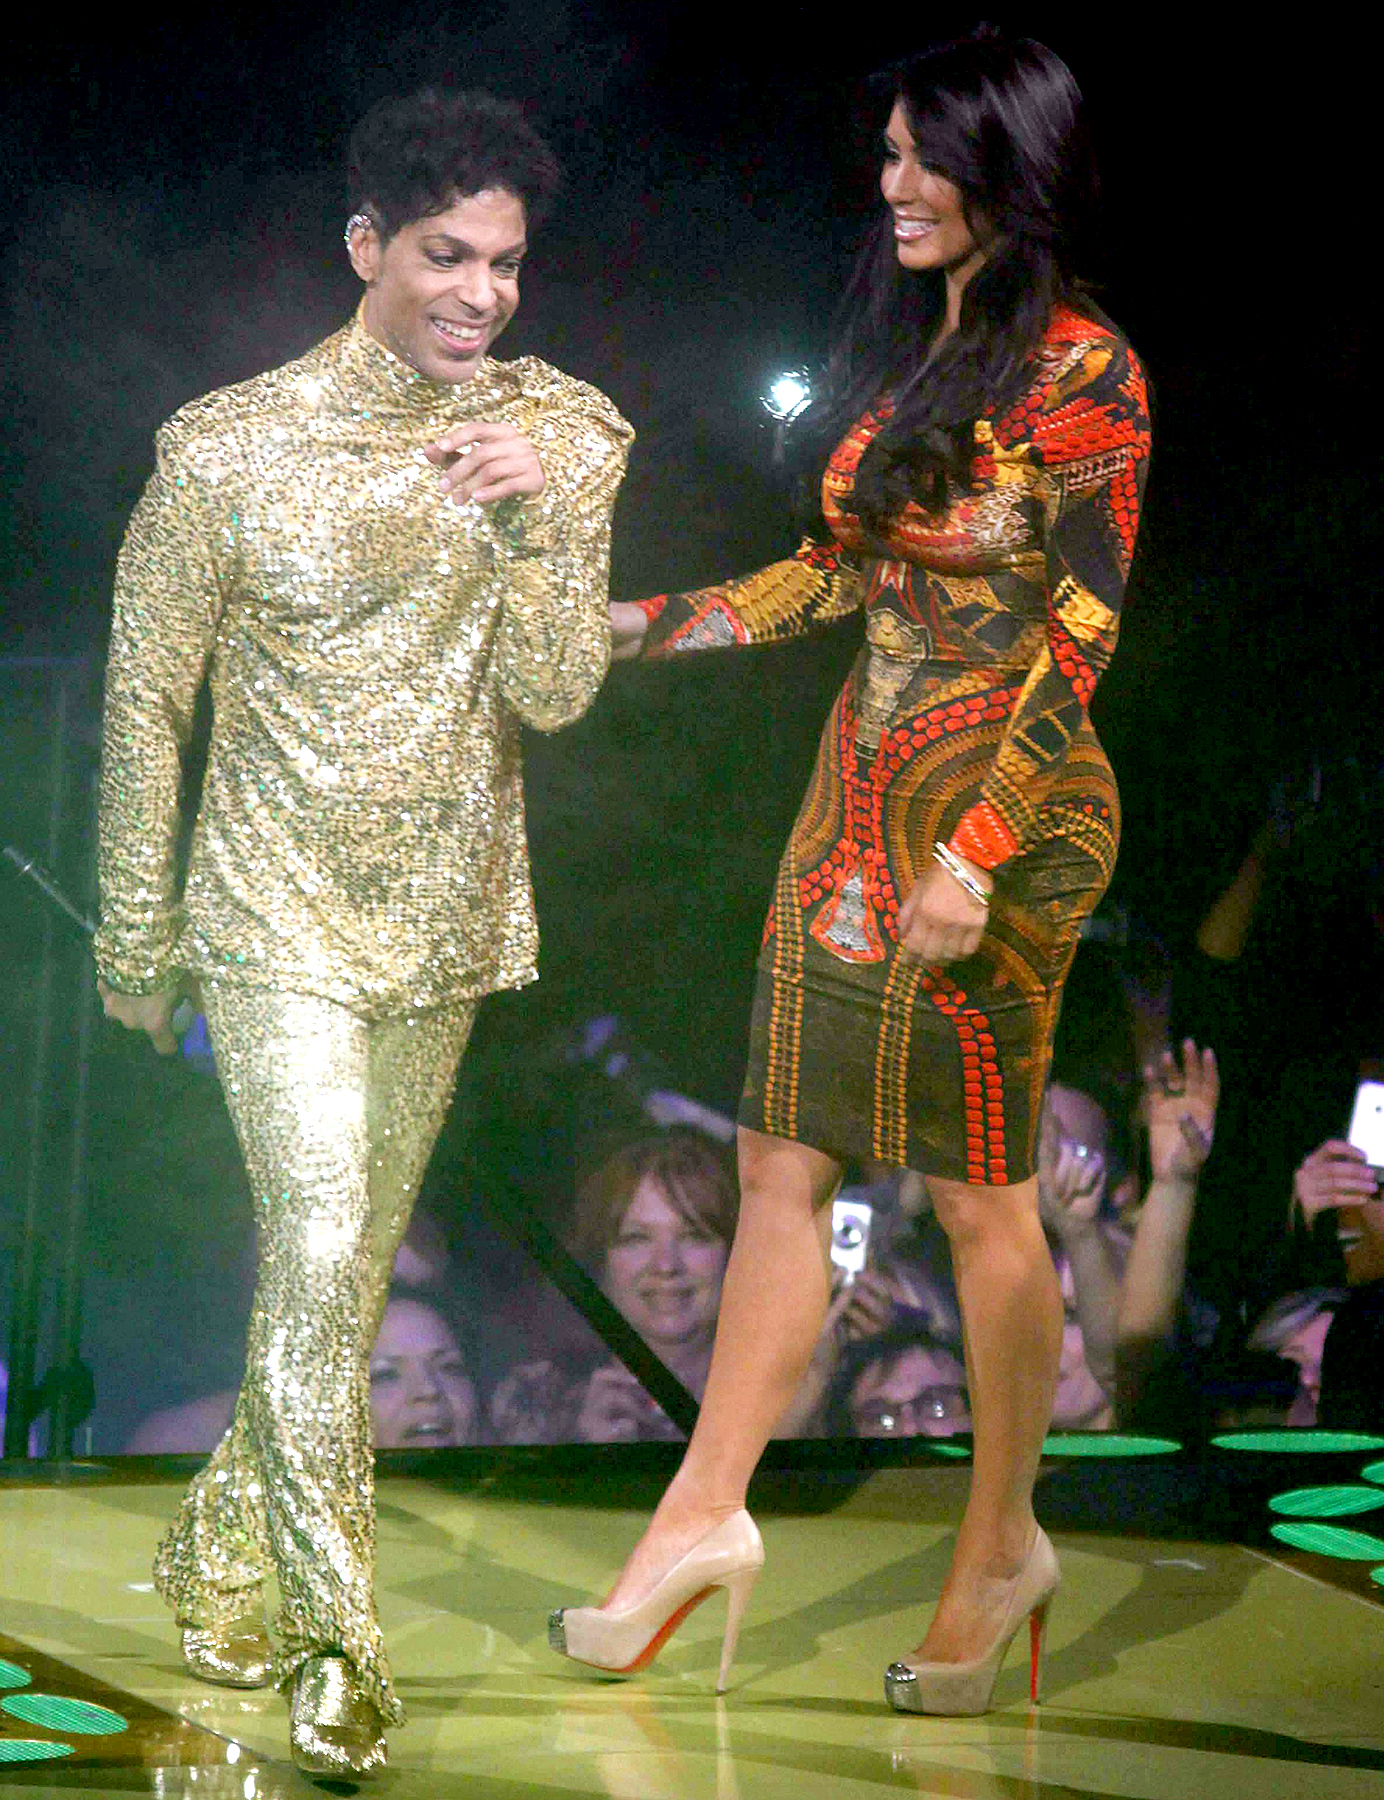 Prince and Kim Kardashian in 2011.